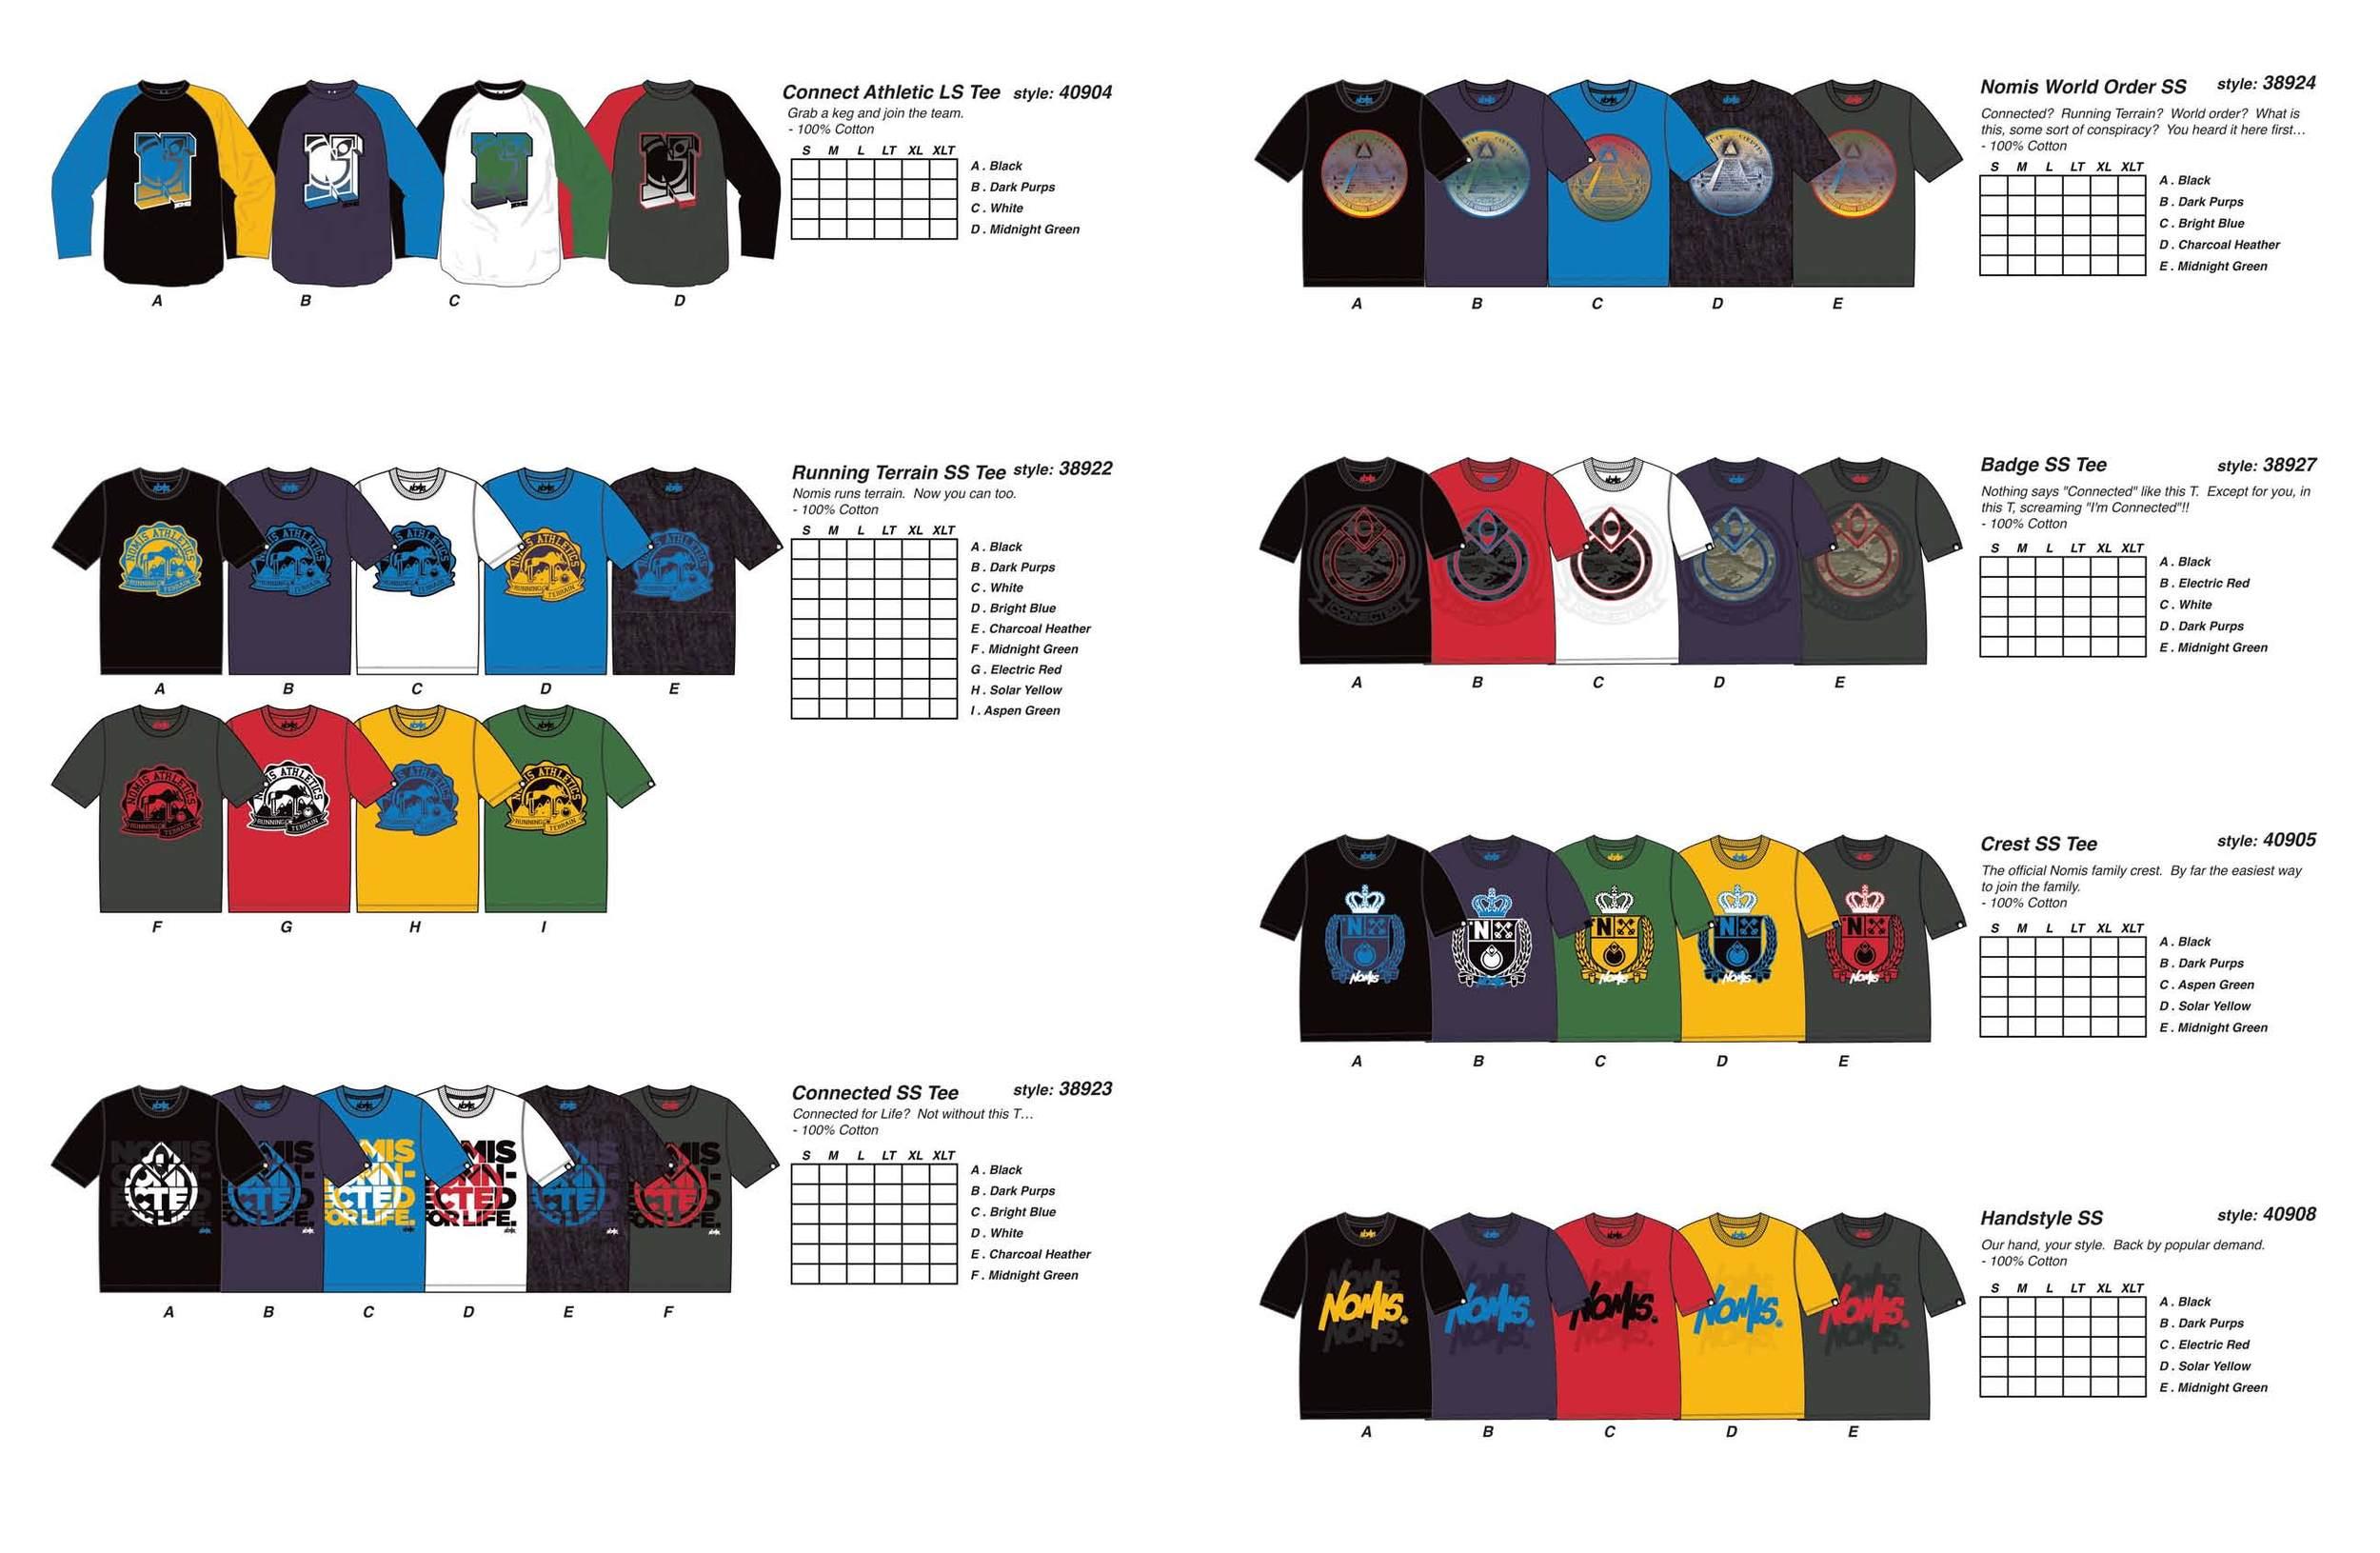 Nomis_BTS_2011_Page_11.jpg